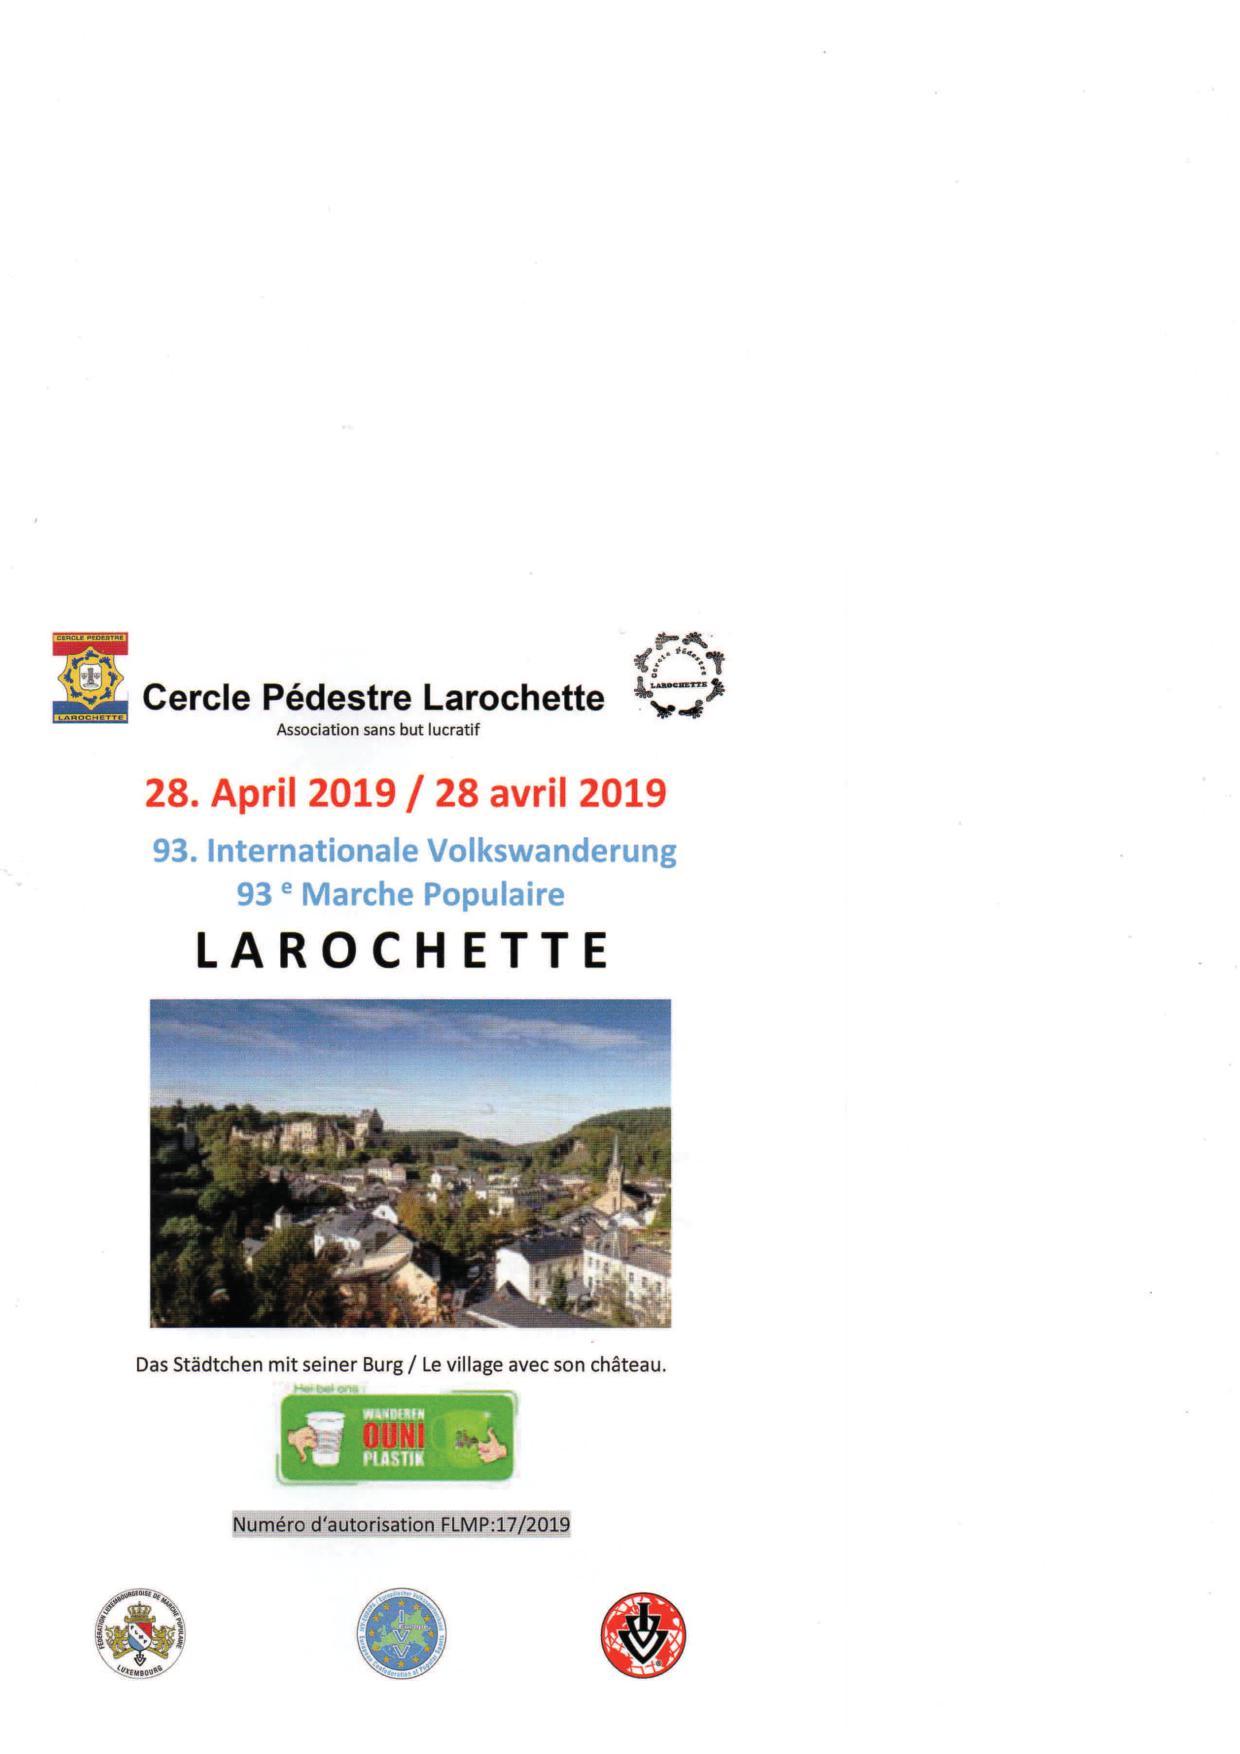 LAROCHETTE FLMP IVV WANDERUNG